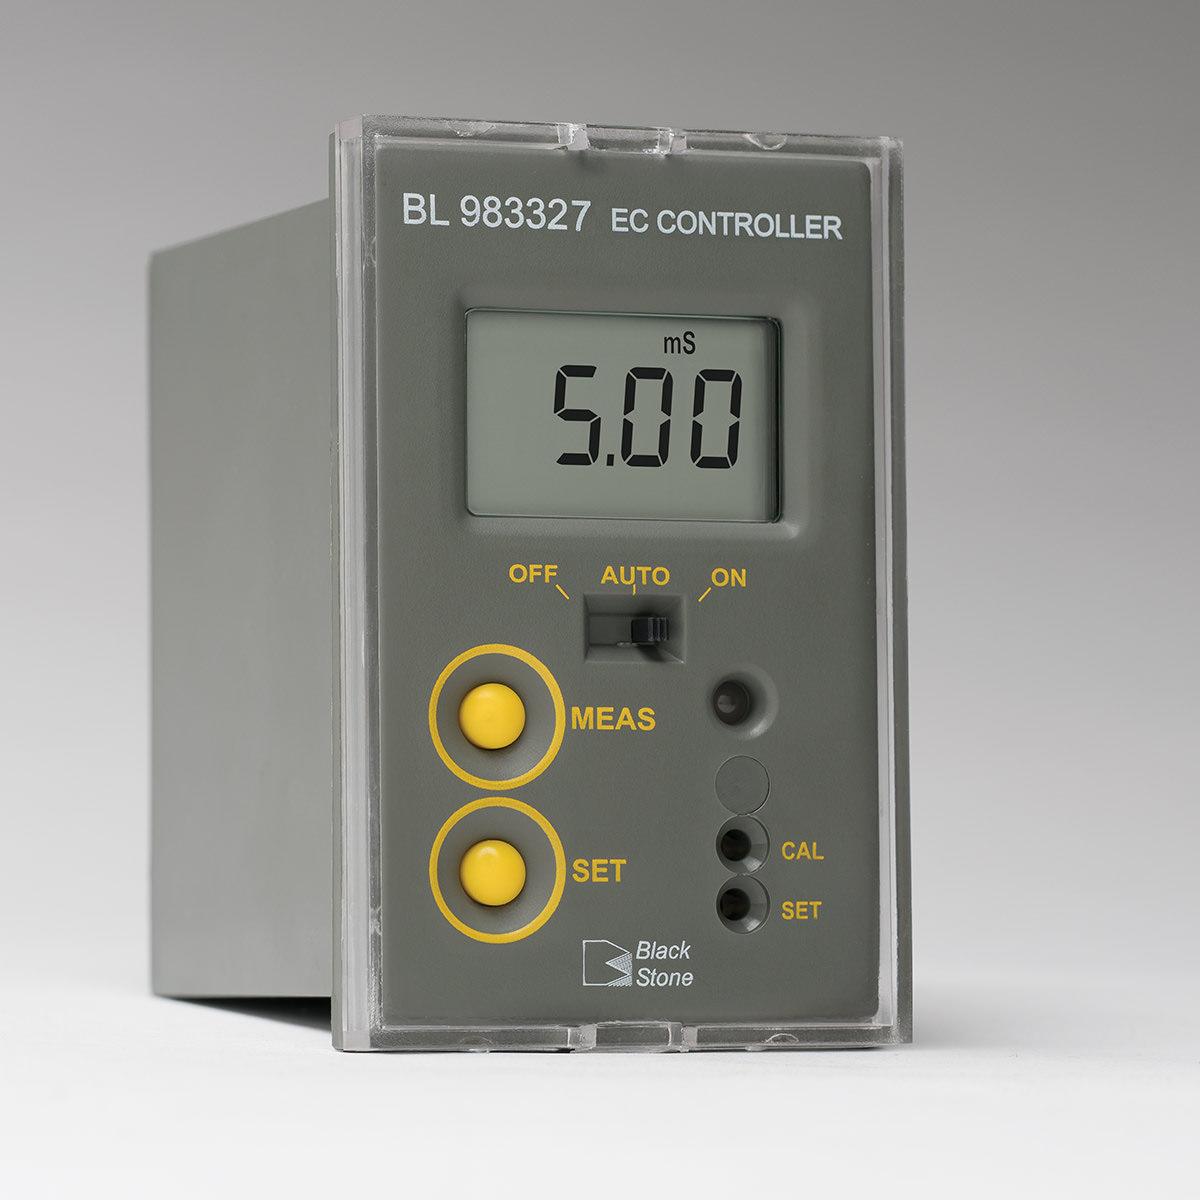 ec-controller-bl983327-angle